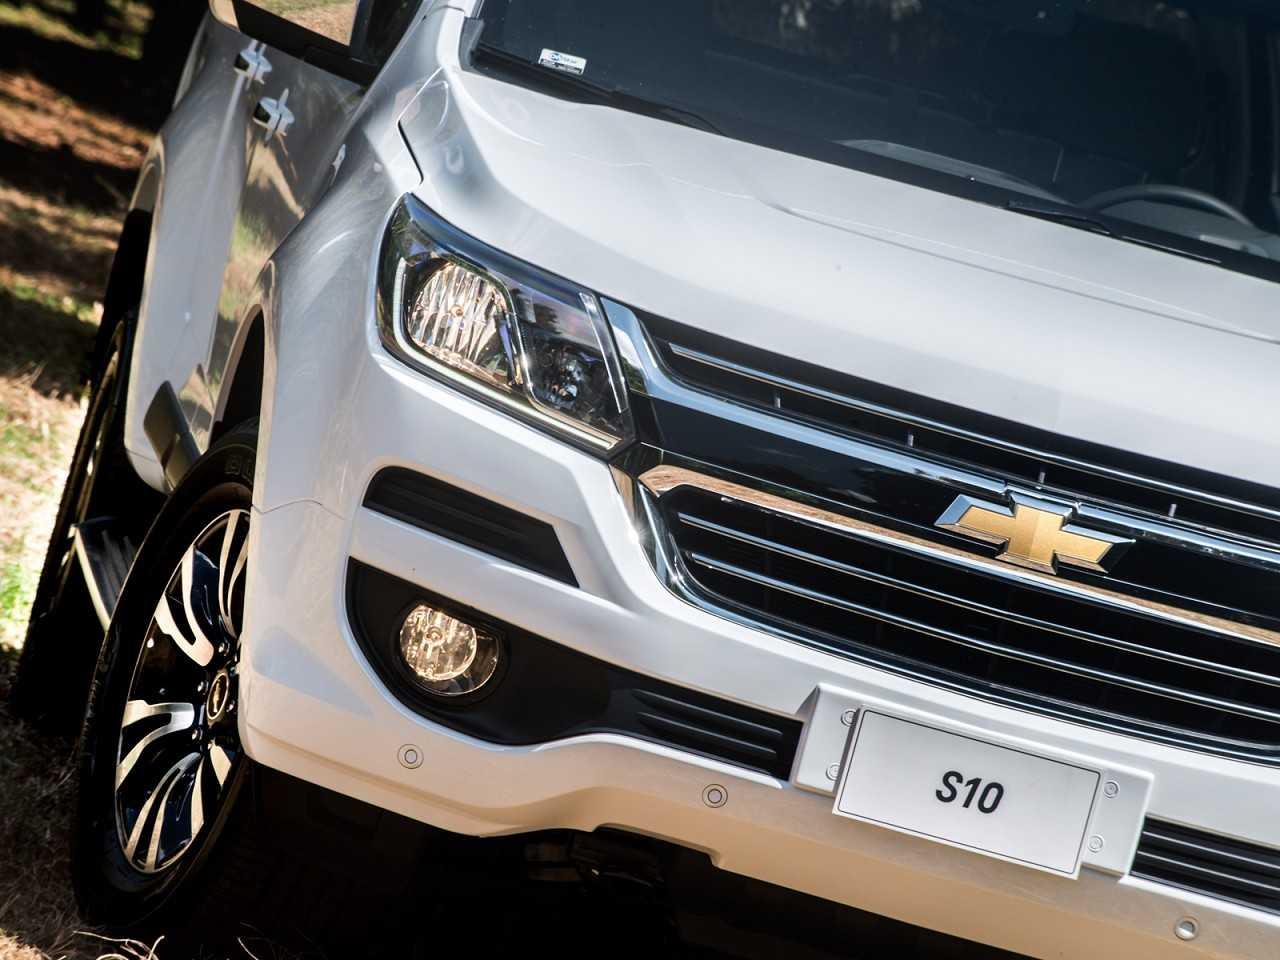 ChevroletS10 2018 - grade frontal